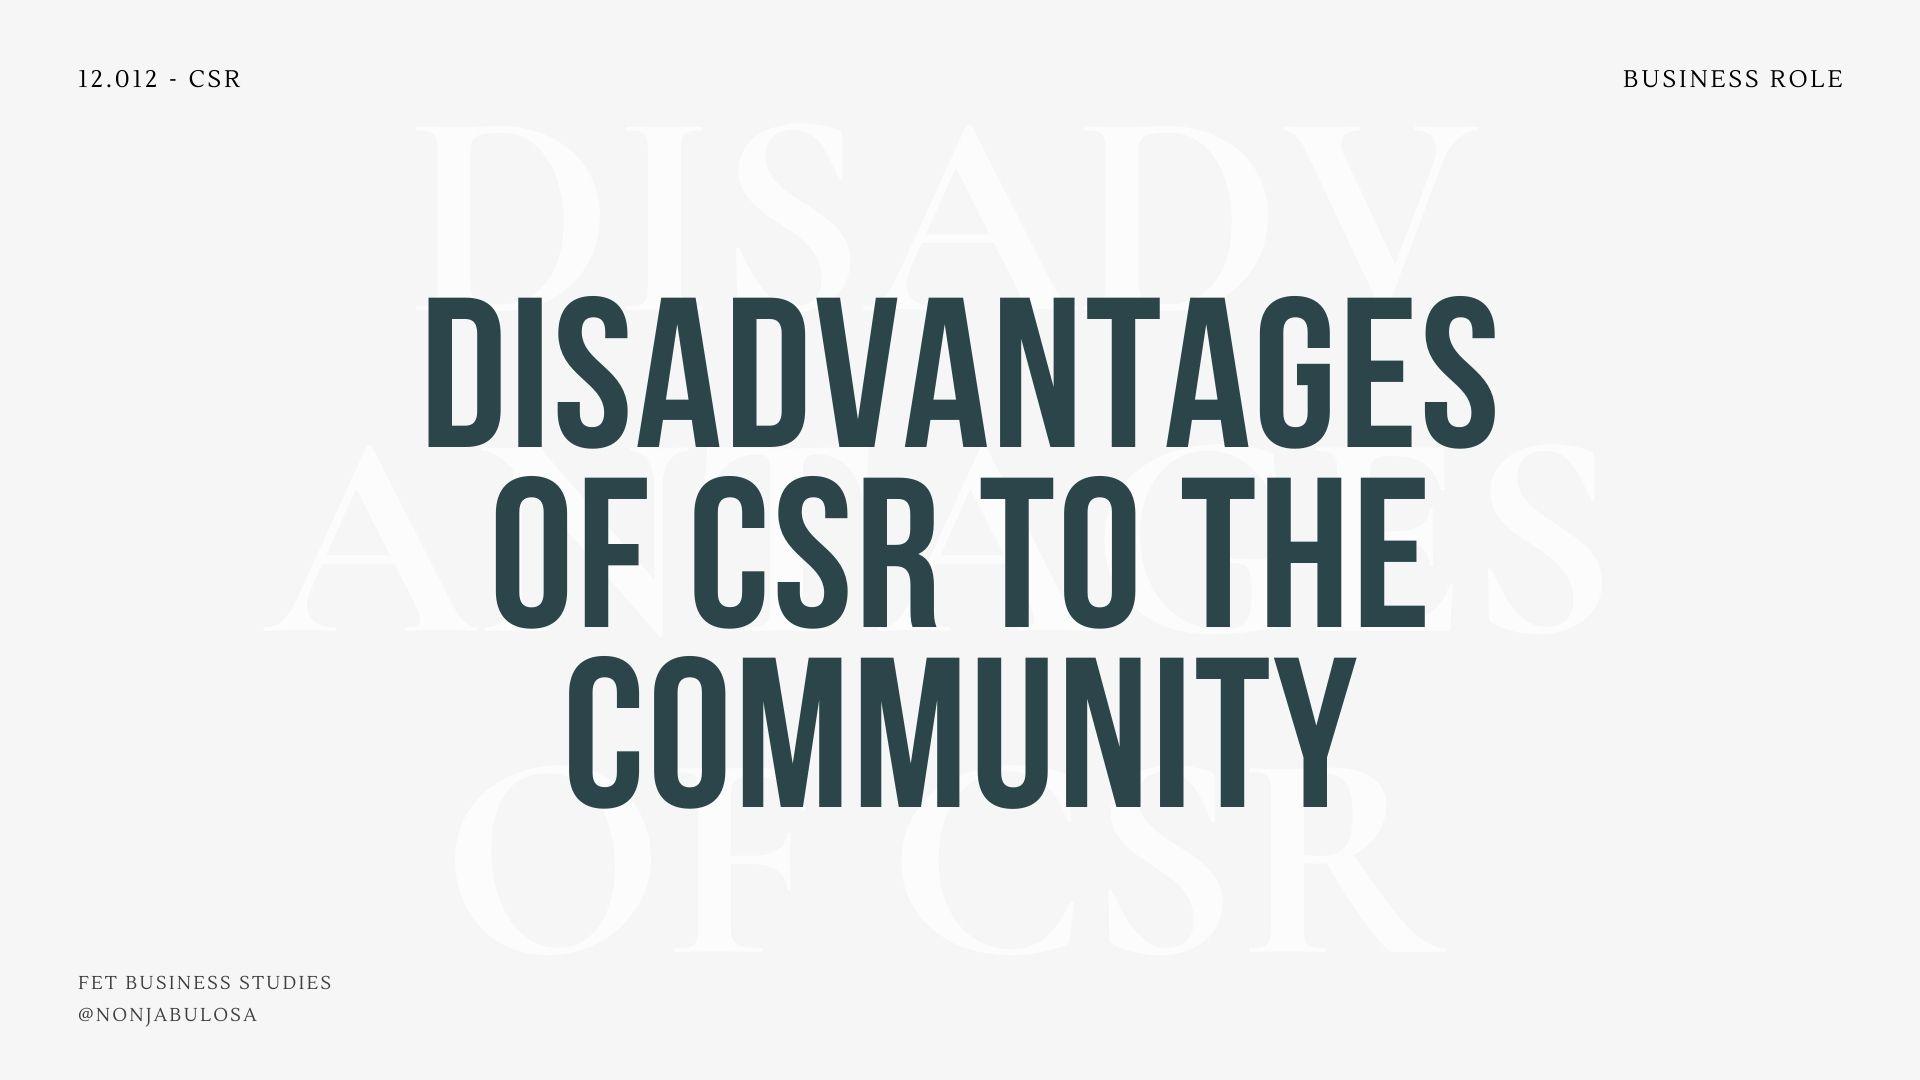 Disadvantage of csr